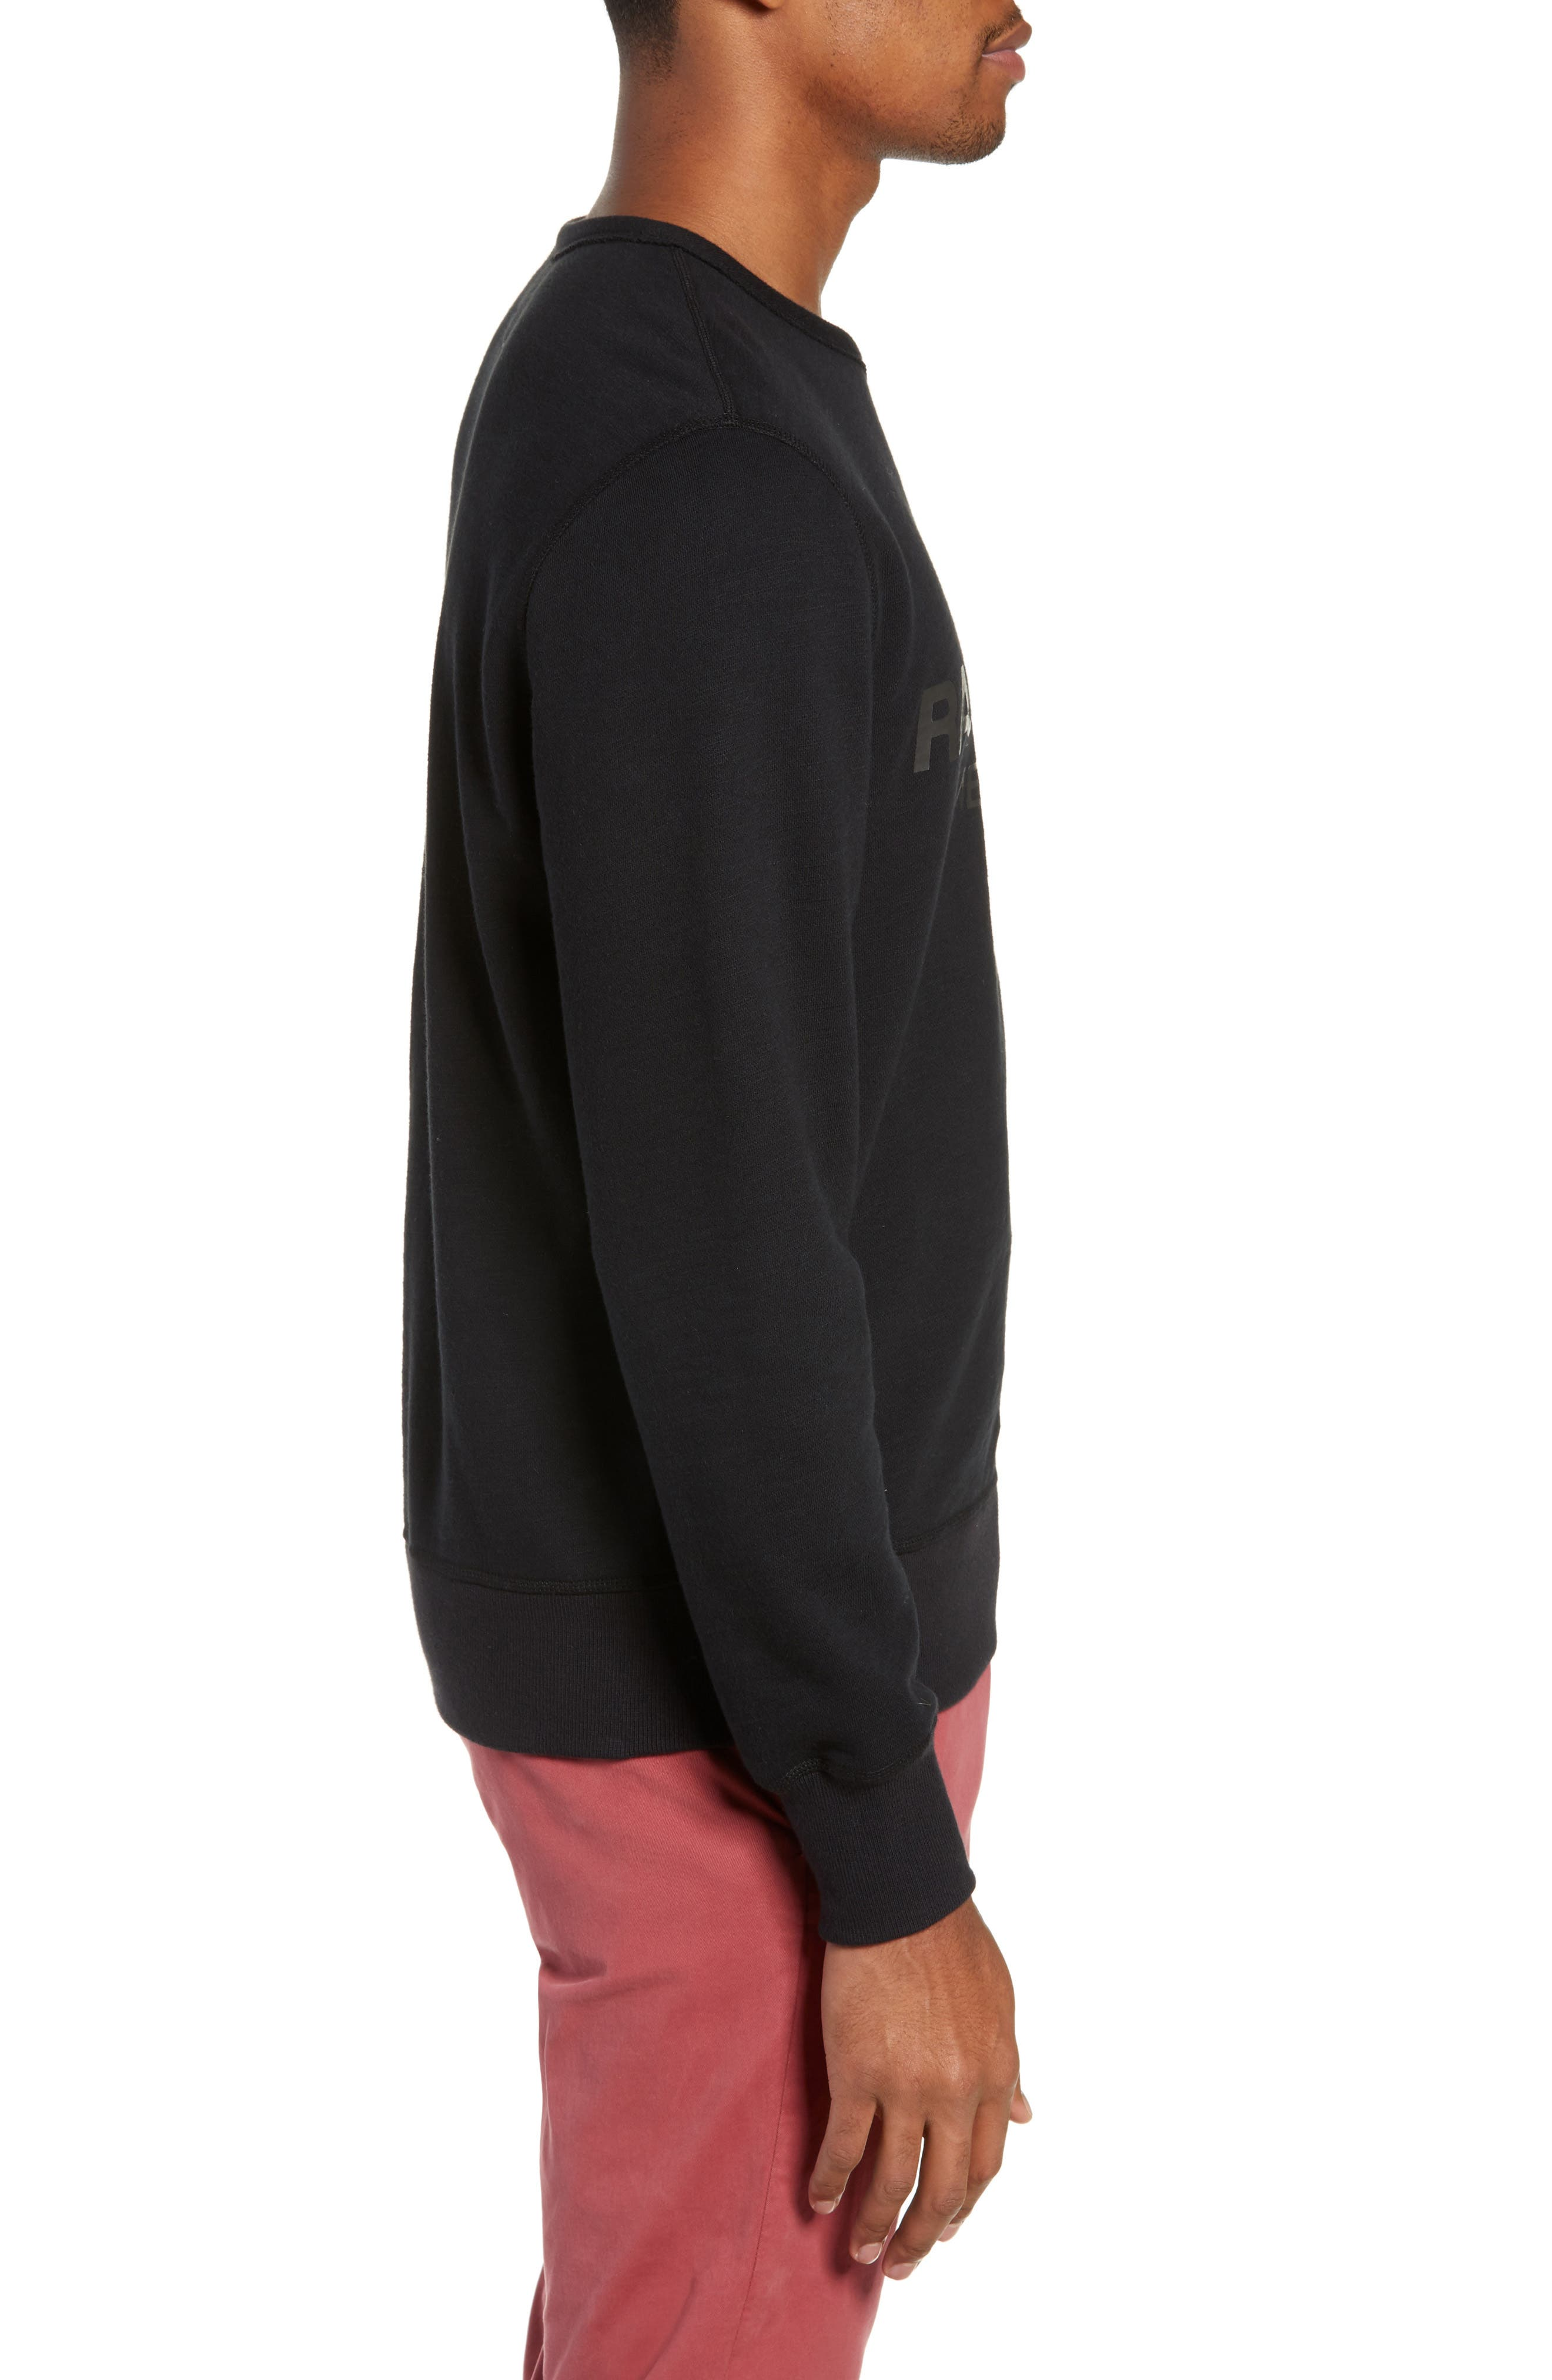 RAG & BONE, Regular Upside Down Sweatshirt, Alternate thumbnail 3, color, 001